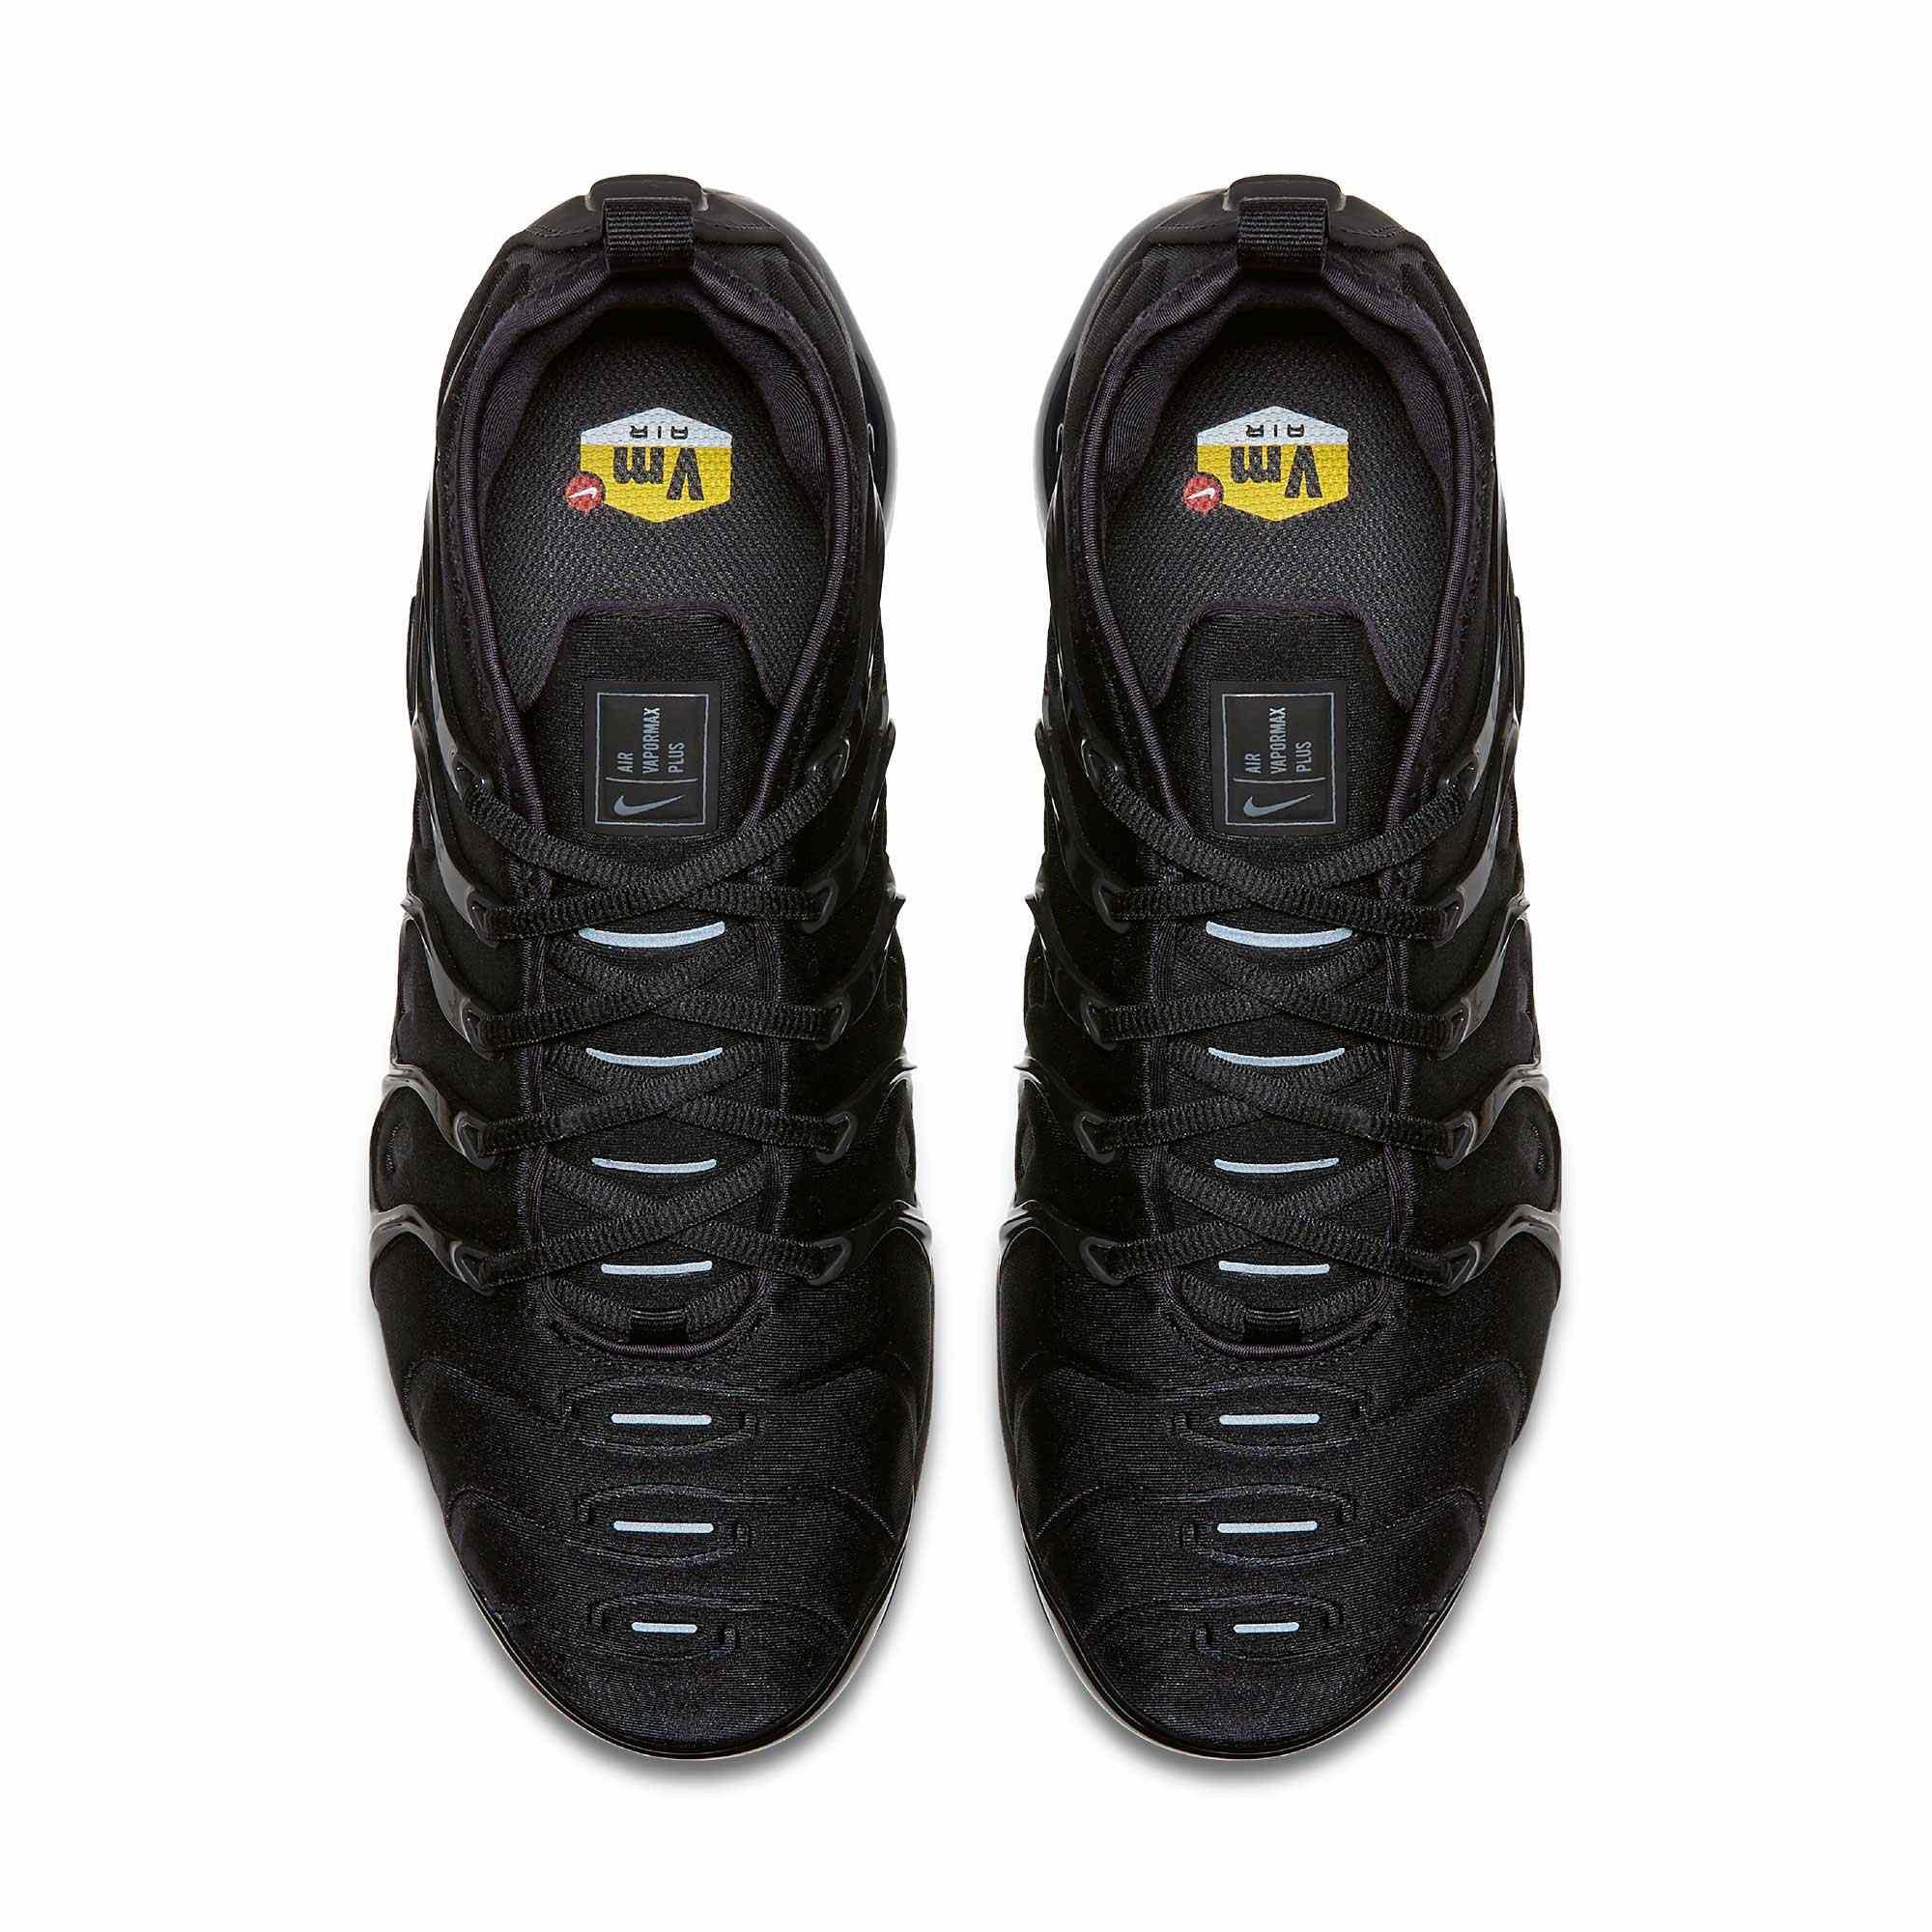 e79aaf760296 ... Original New Arrival Authentic NIKE AIR VAPORMAX PLUS Mens Running  Shoes Sneakers 924453 Outdoor Walking jogging ...